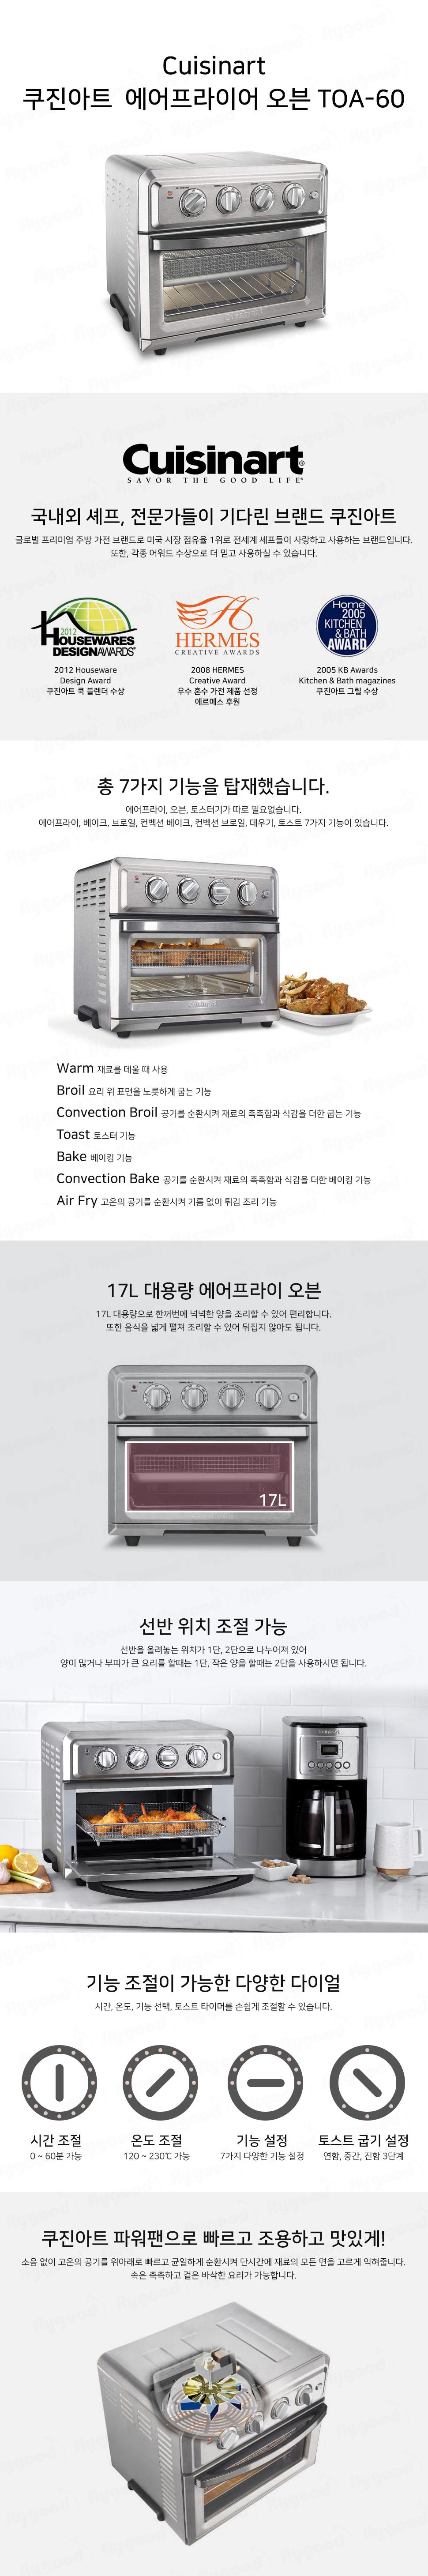 Cuisinart_air_fryer_toaster_oven_TOA-60_01.jpg